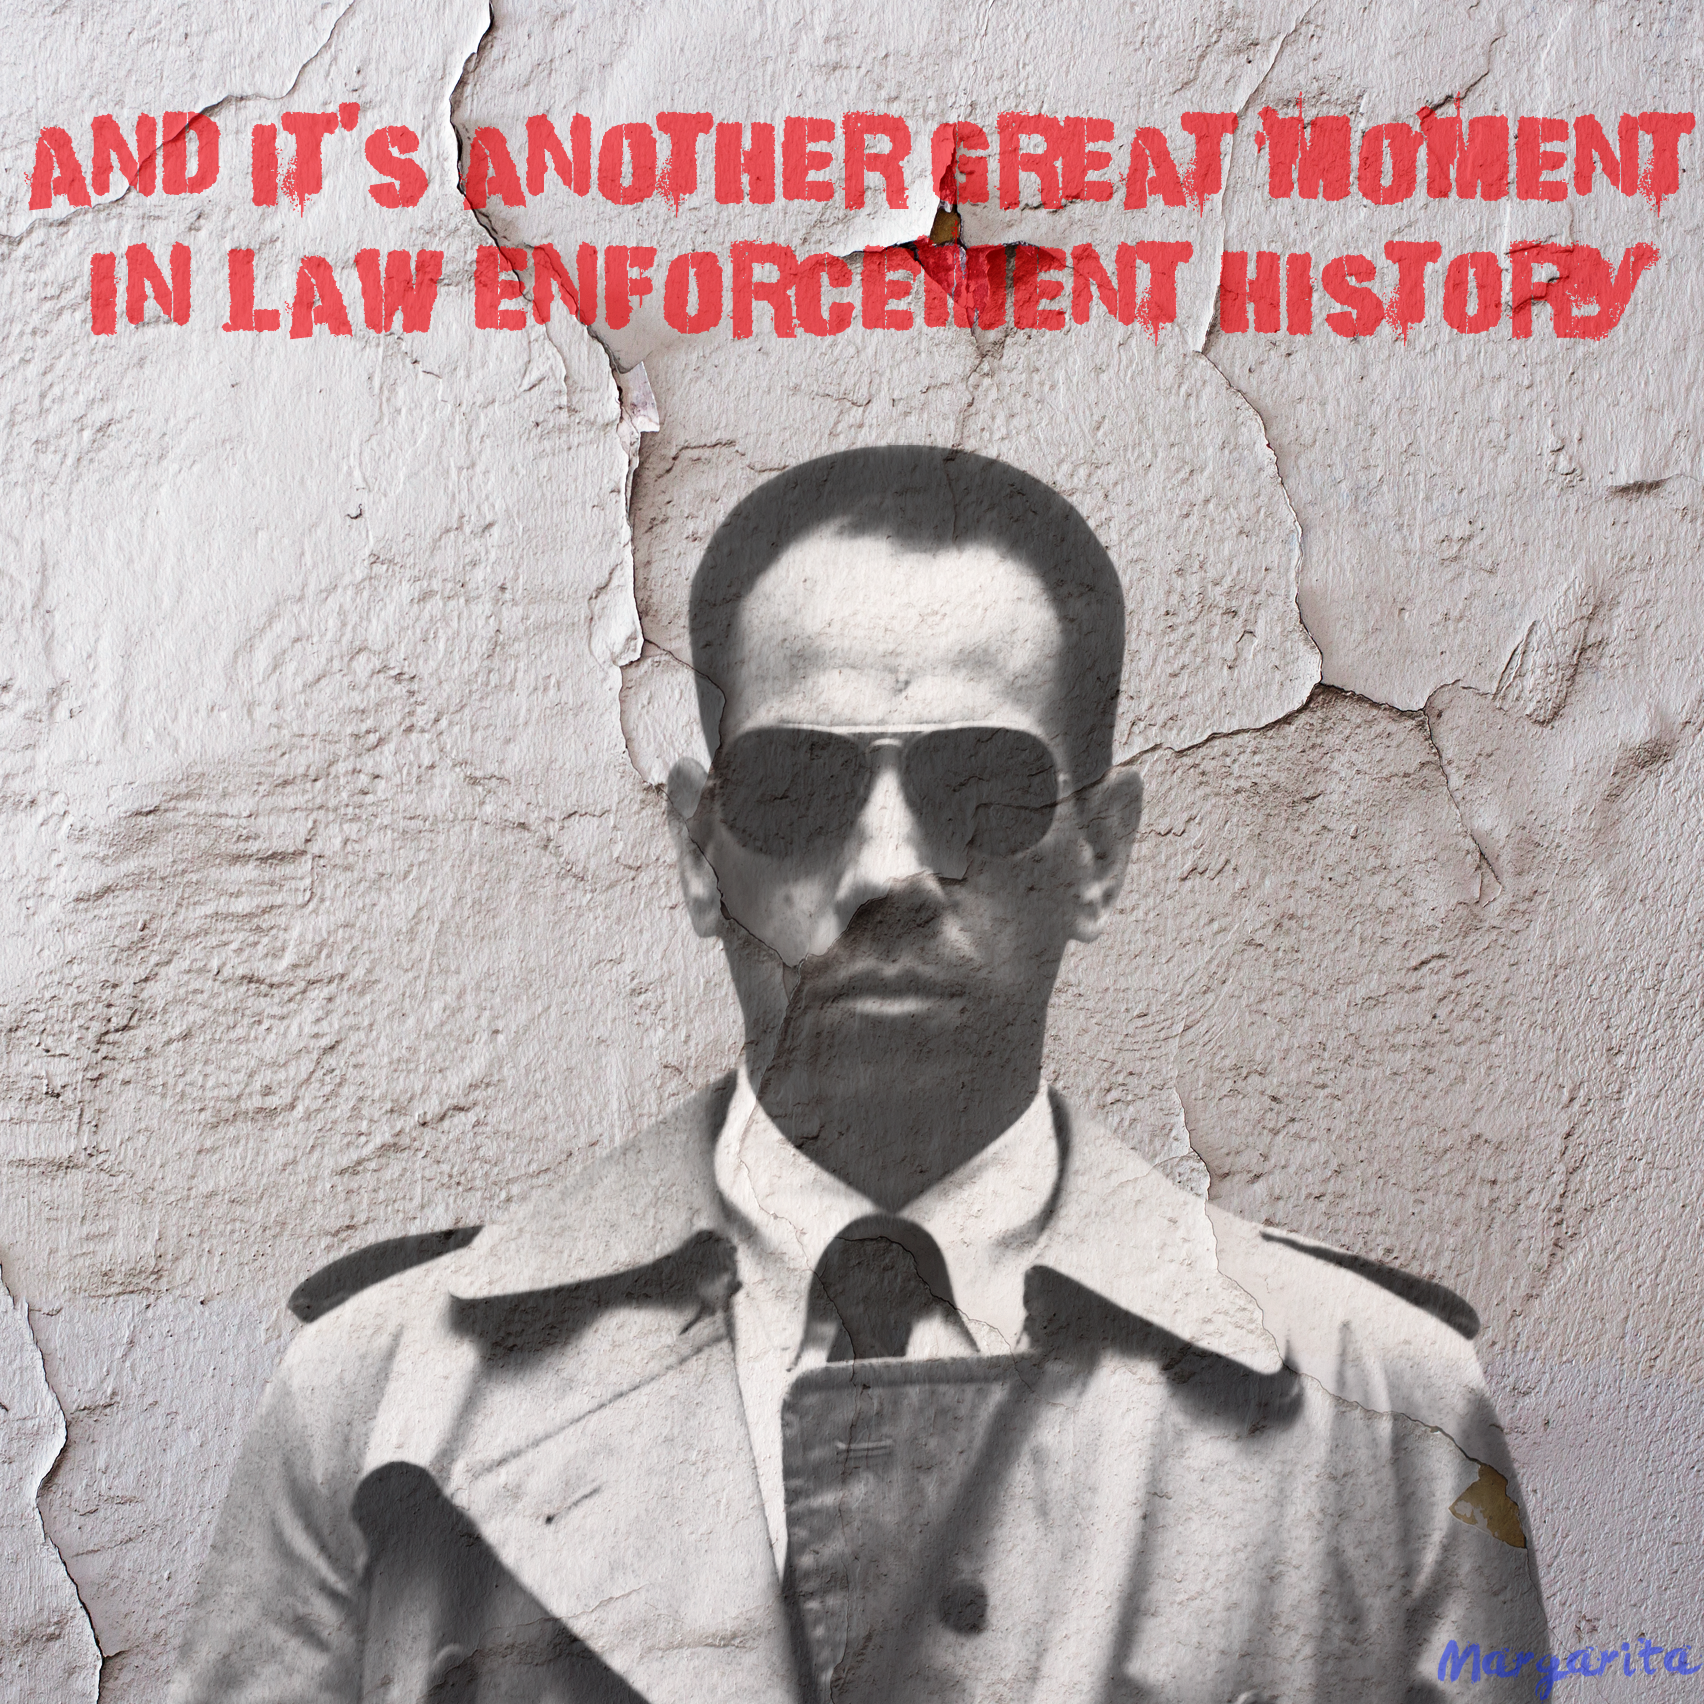 Law enforcement history.png